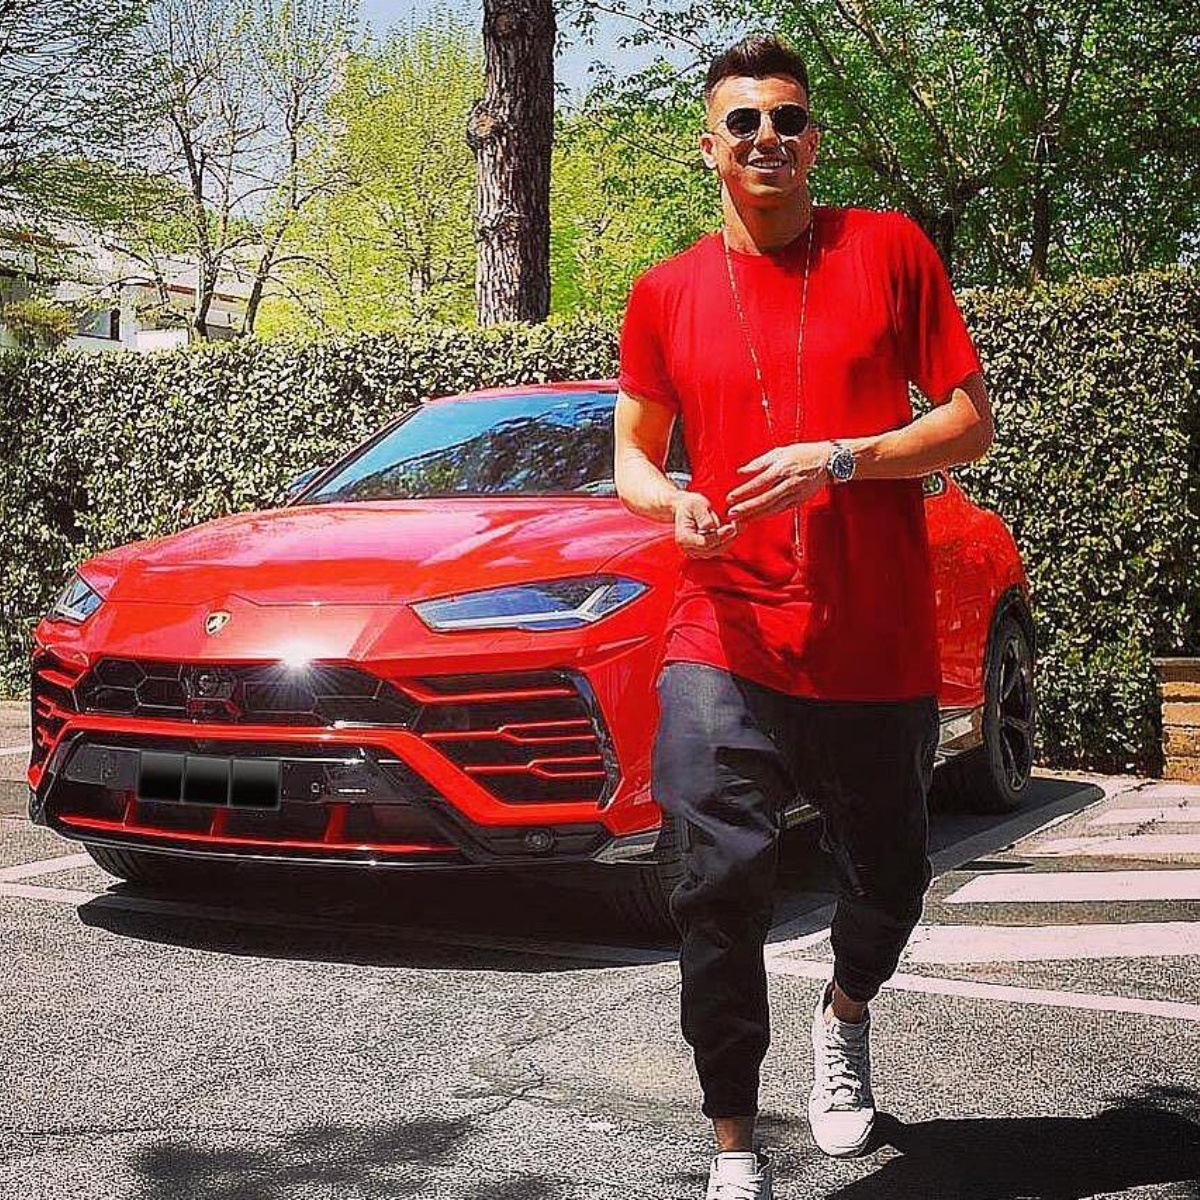 La historia que involucra a un chileno, El Shaarawy, un Lamborghini y la  justicia italiana   TNT Sports